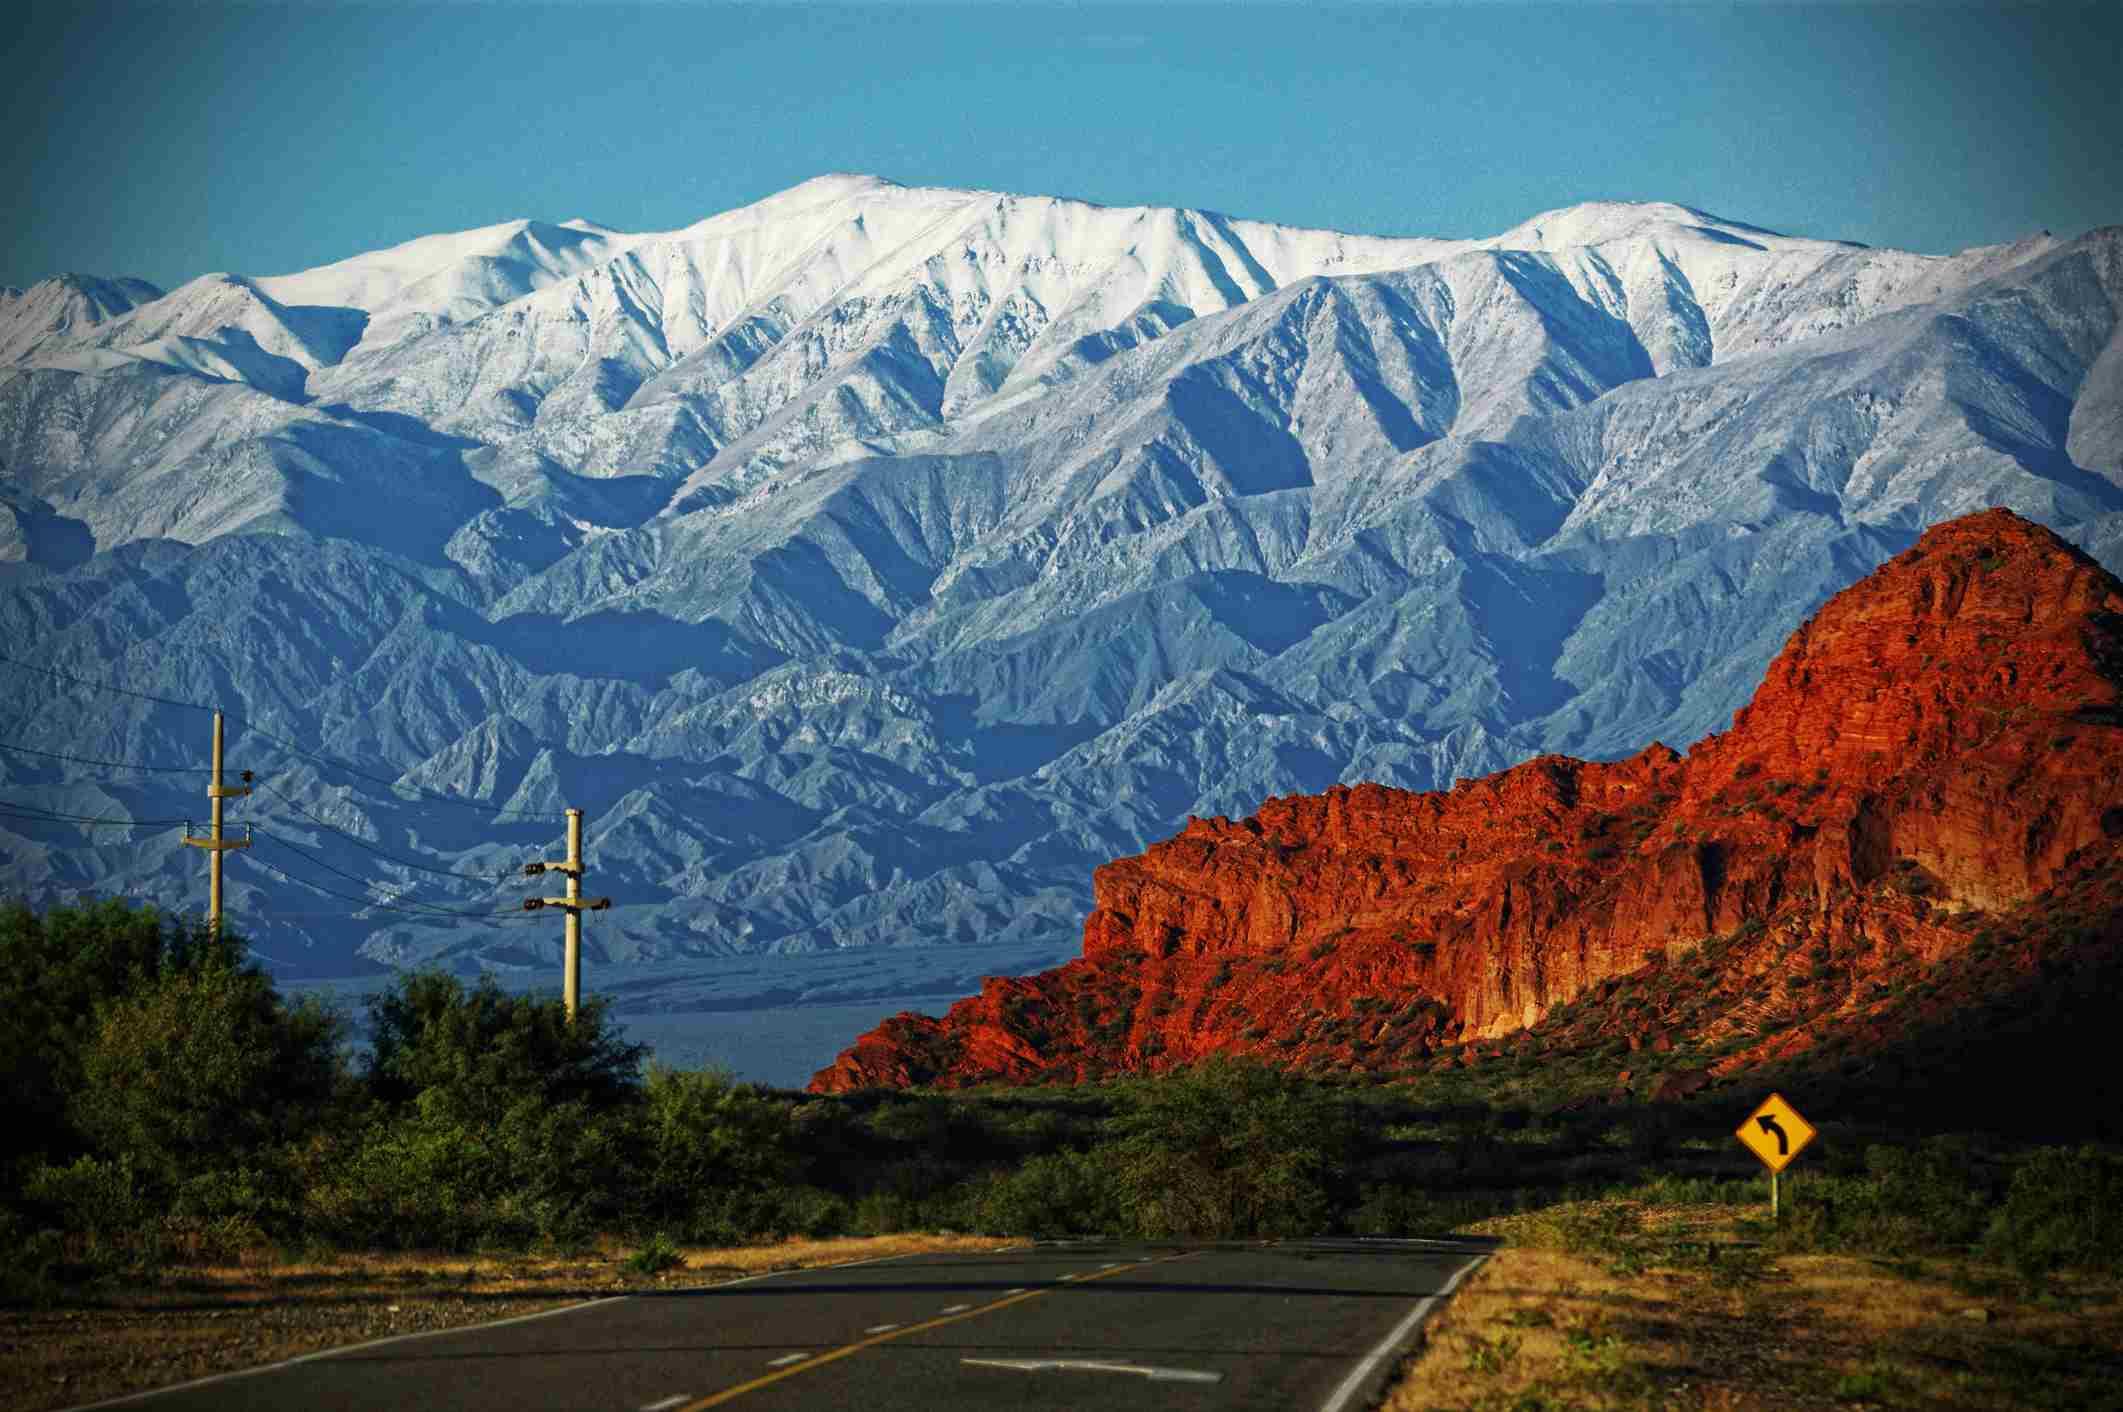 Ruta 40 conduciendo a través de montañas de Argentina